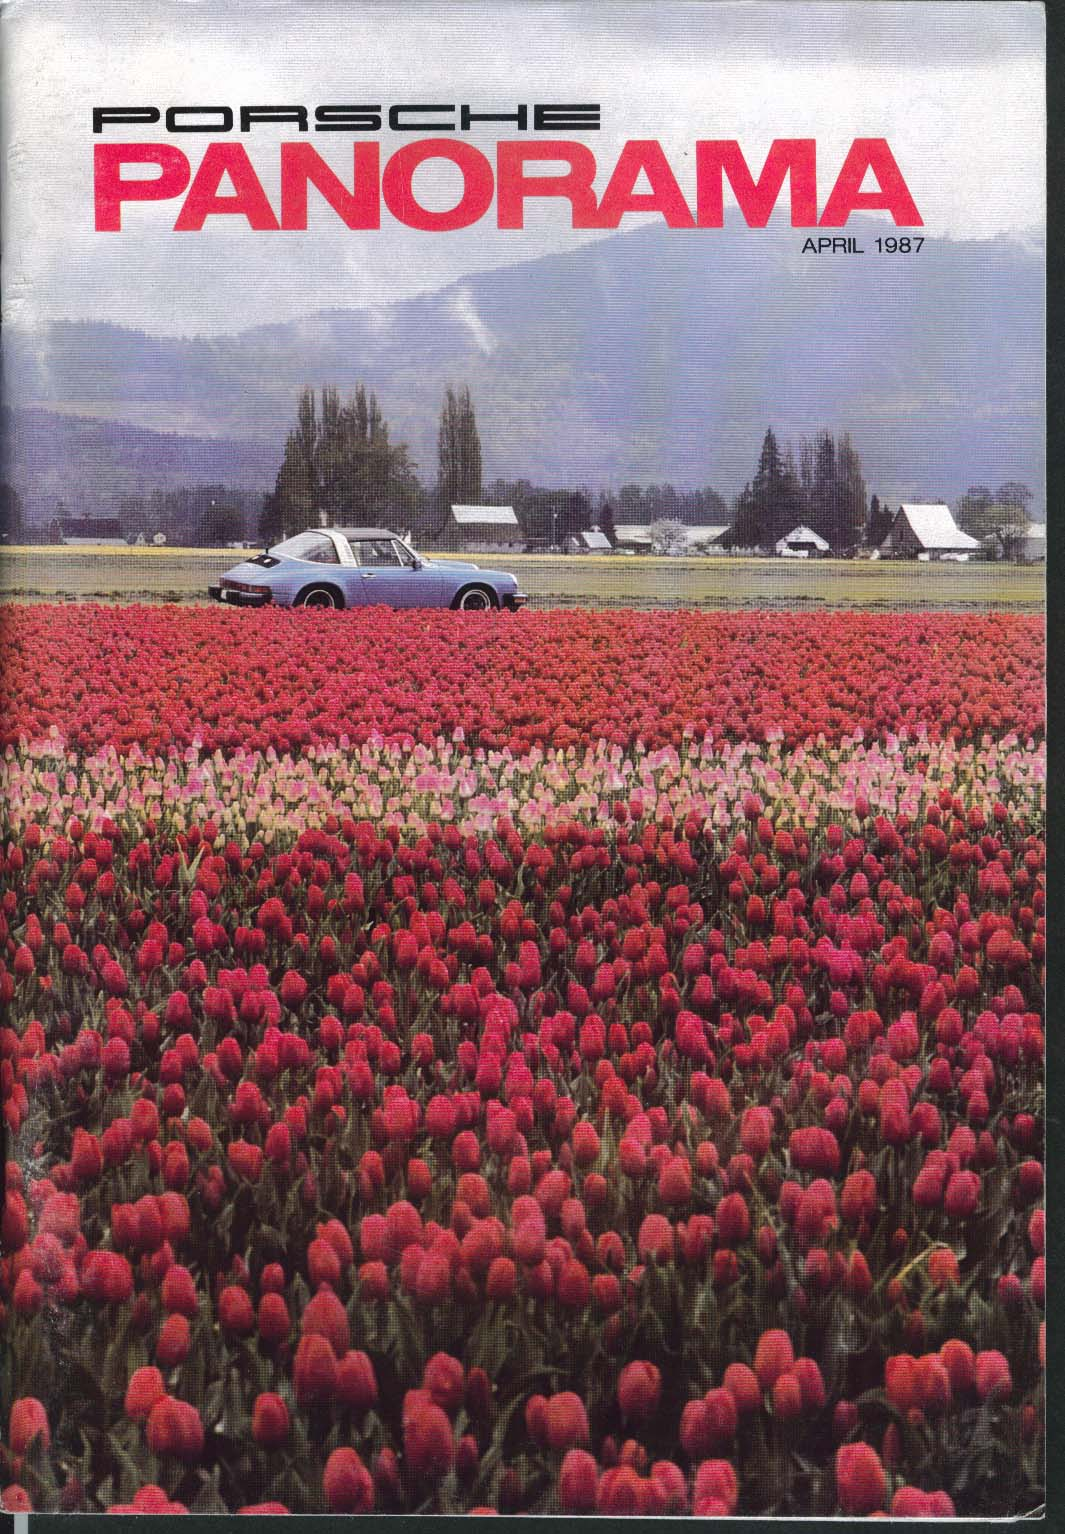 PORSCHE PANORAMA Savannah Sauna Nissan Elva-Porsche Camelot Solo I & II 4 1987